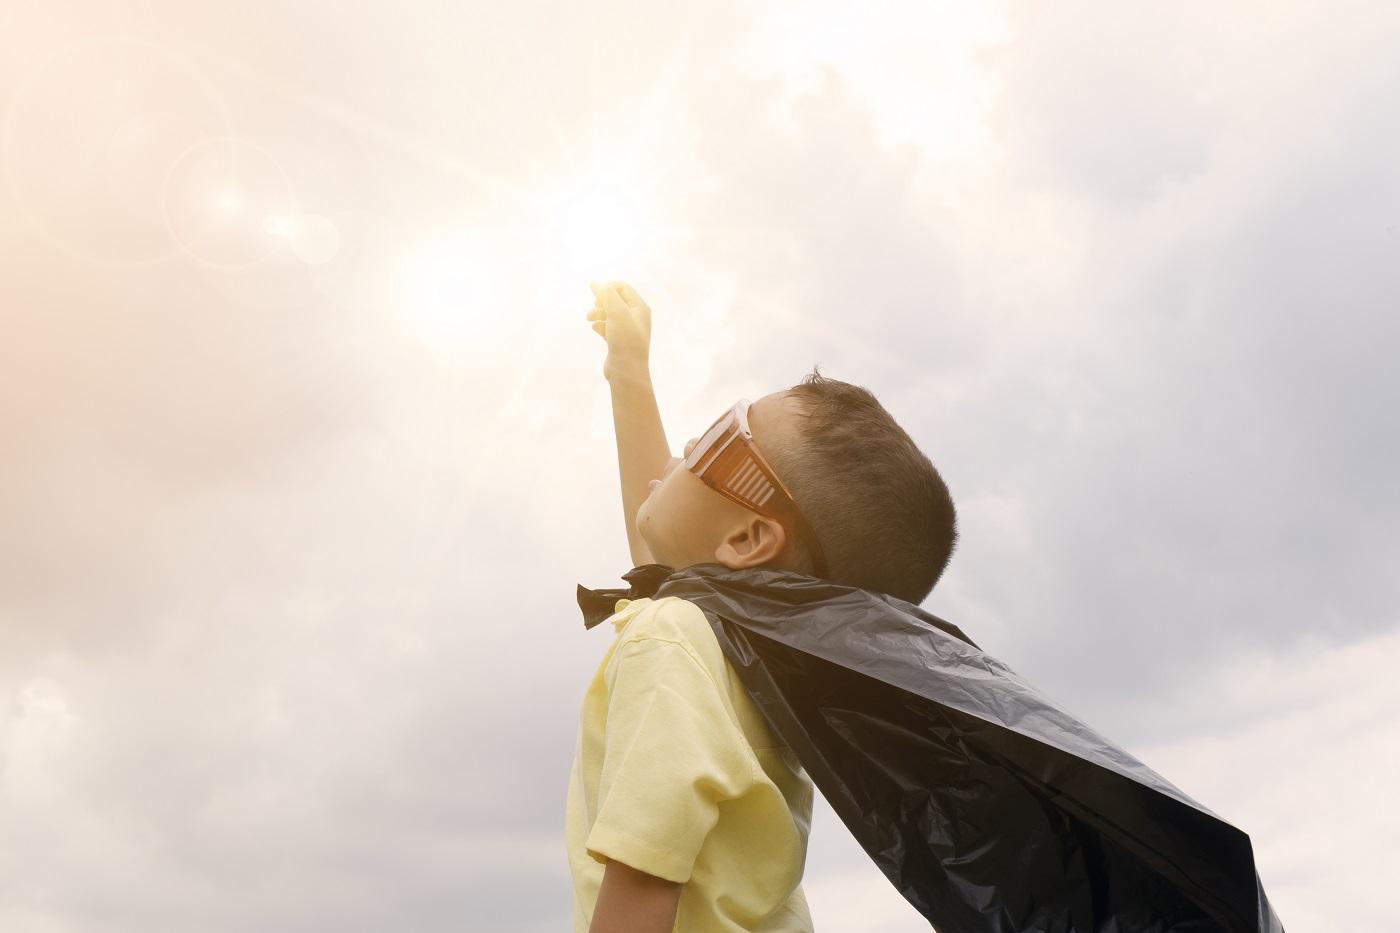 happy kid playing superhero